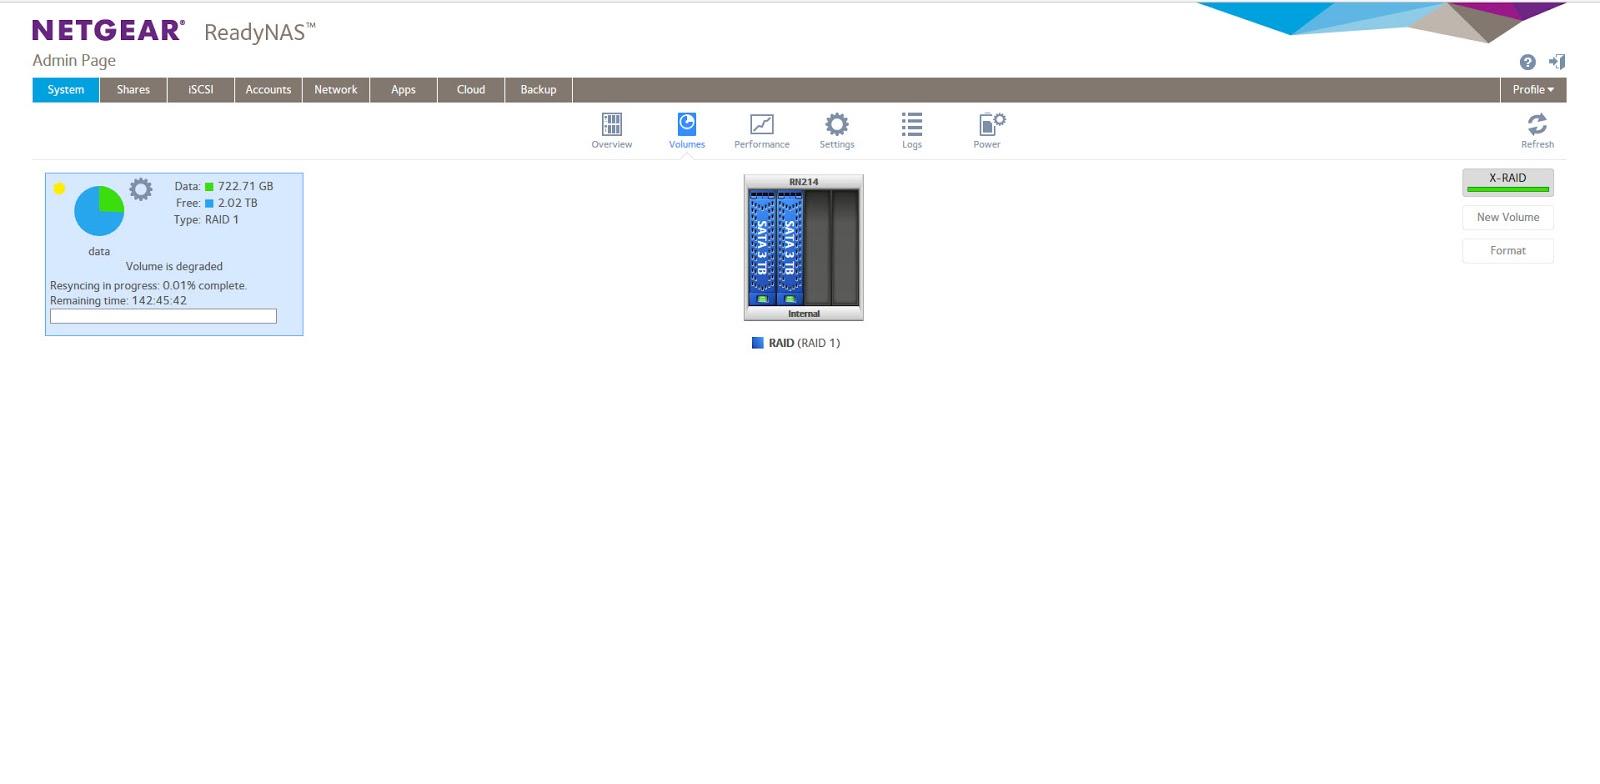 Computer & Technology Reviews: Review of Netgear ReadyNAS